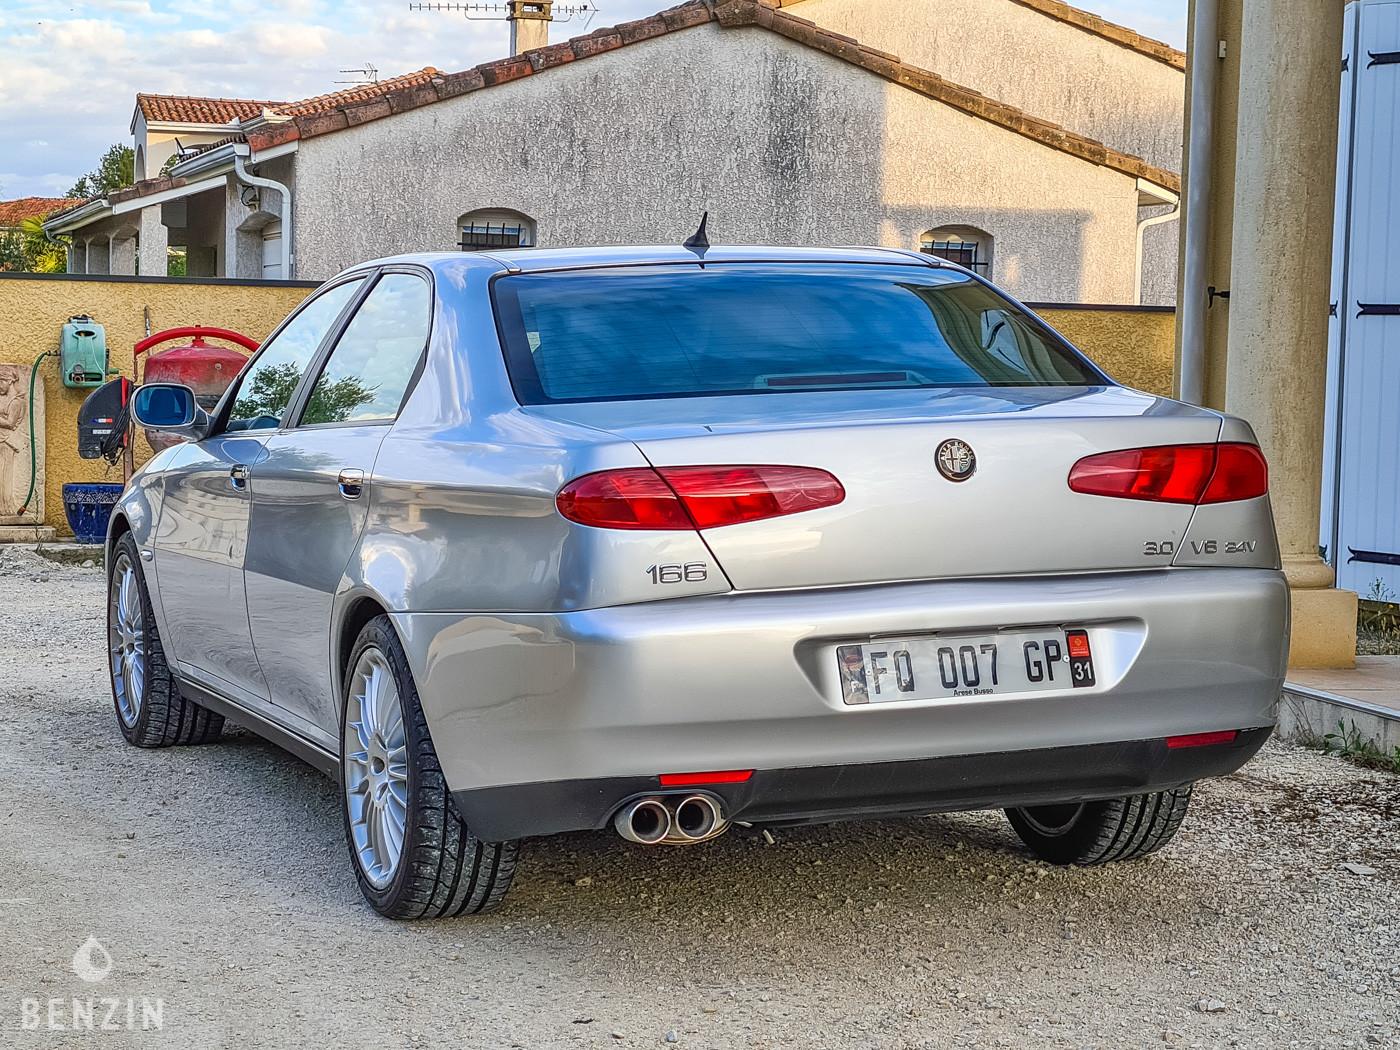 Alfa Romeo 166 Occasion à vendre